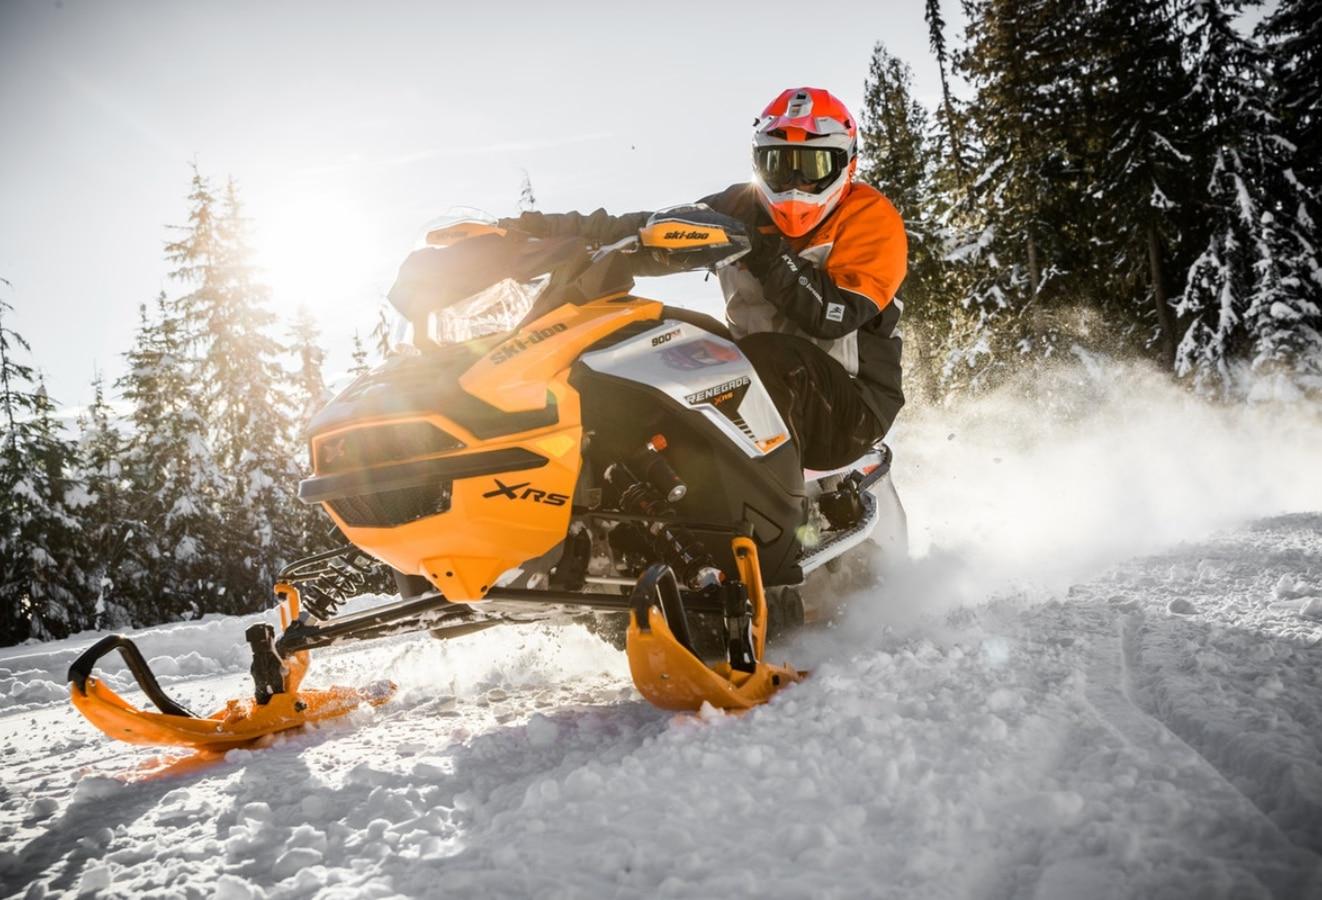 5 Cool Things about Ski-Doo REV Gen4 Snowmobiles